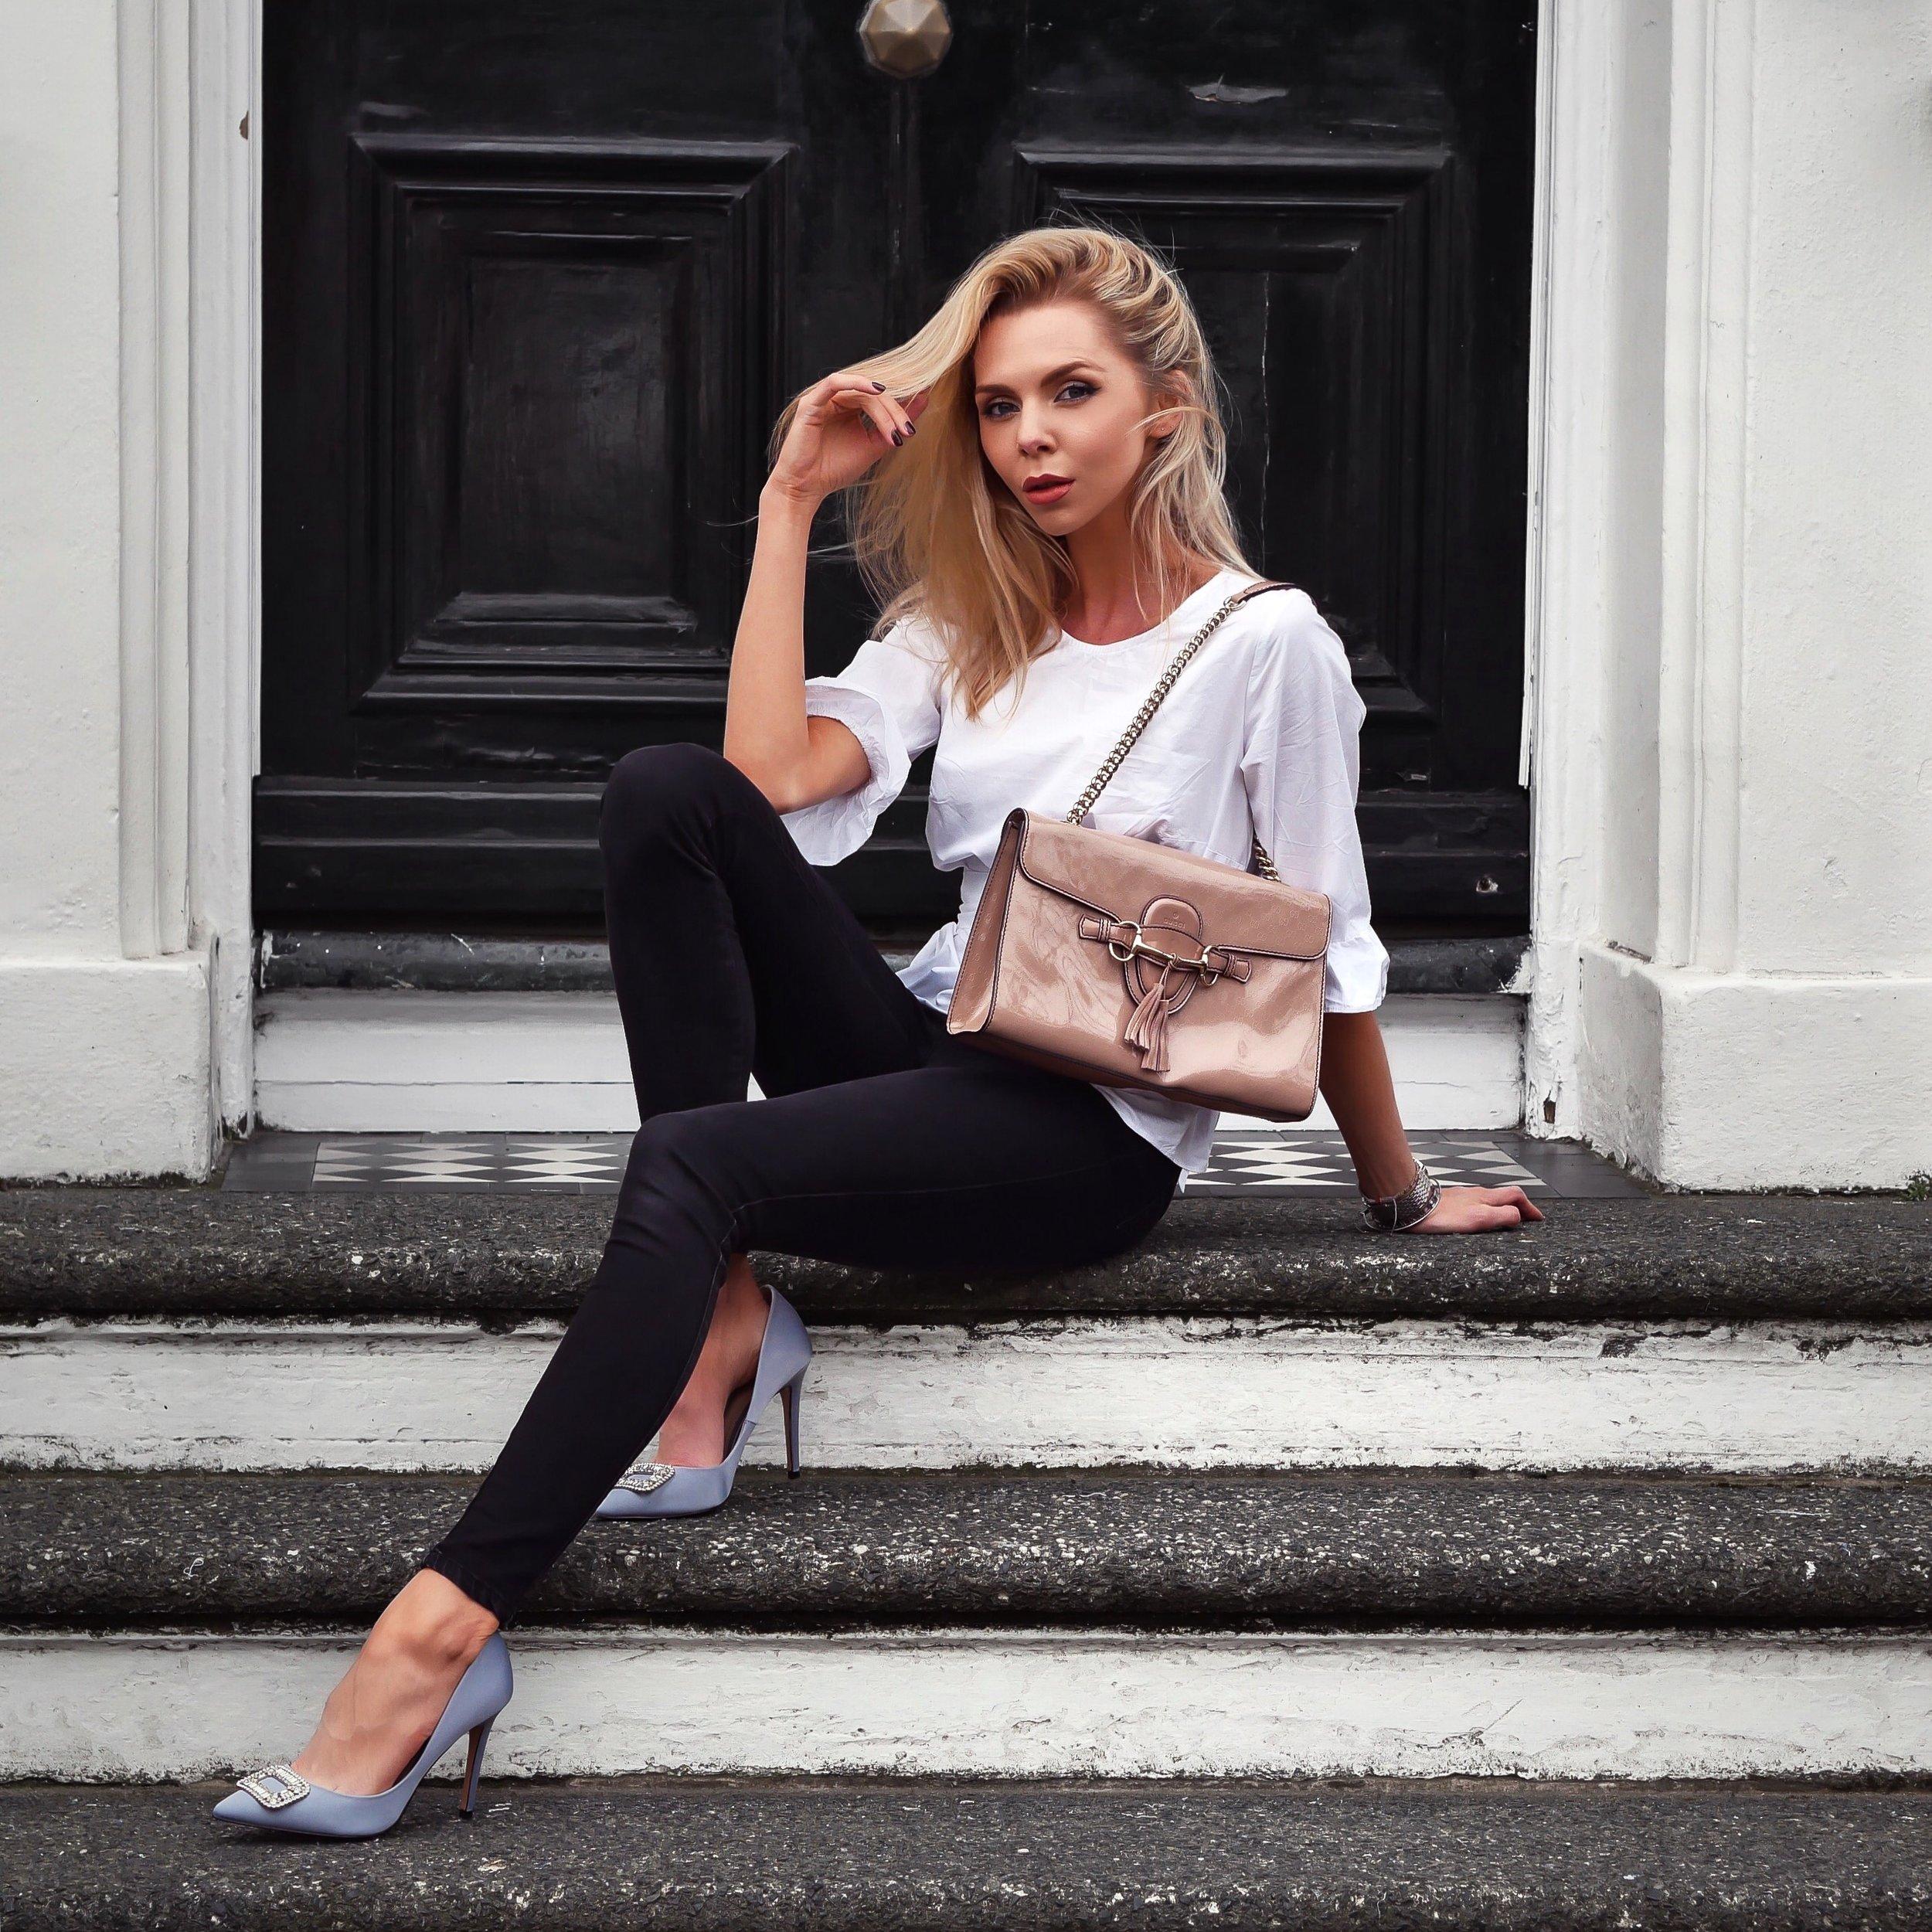 haul, affordable fashion, streetstyle, inspiration, what to wear, fashion, lookbook, style, fashion blogger, laura blair, youtuber, london fashion girl, debenhams, red